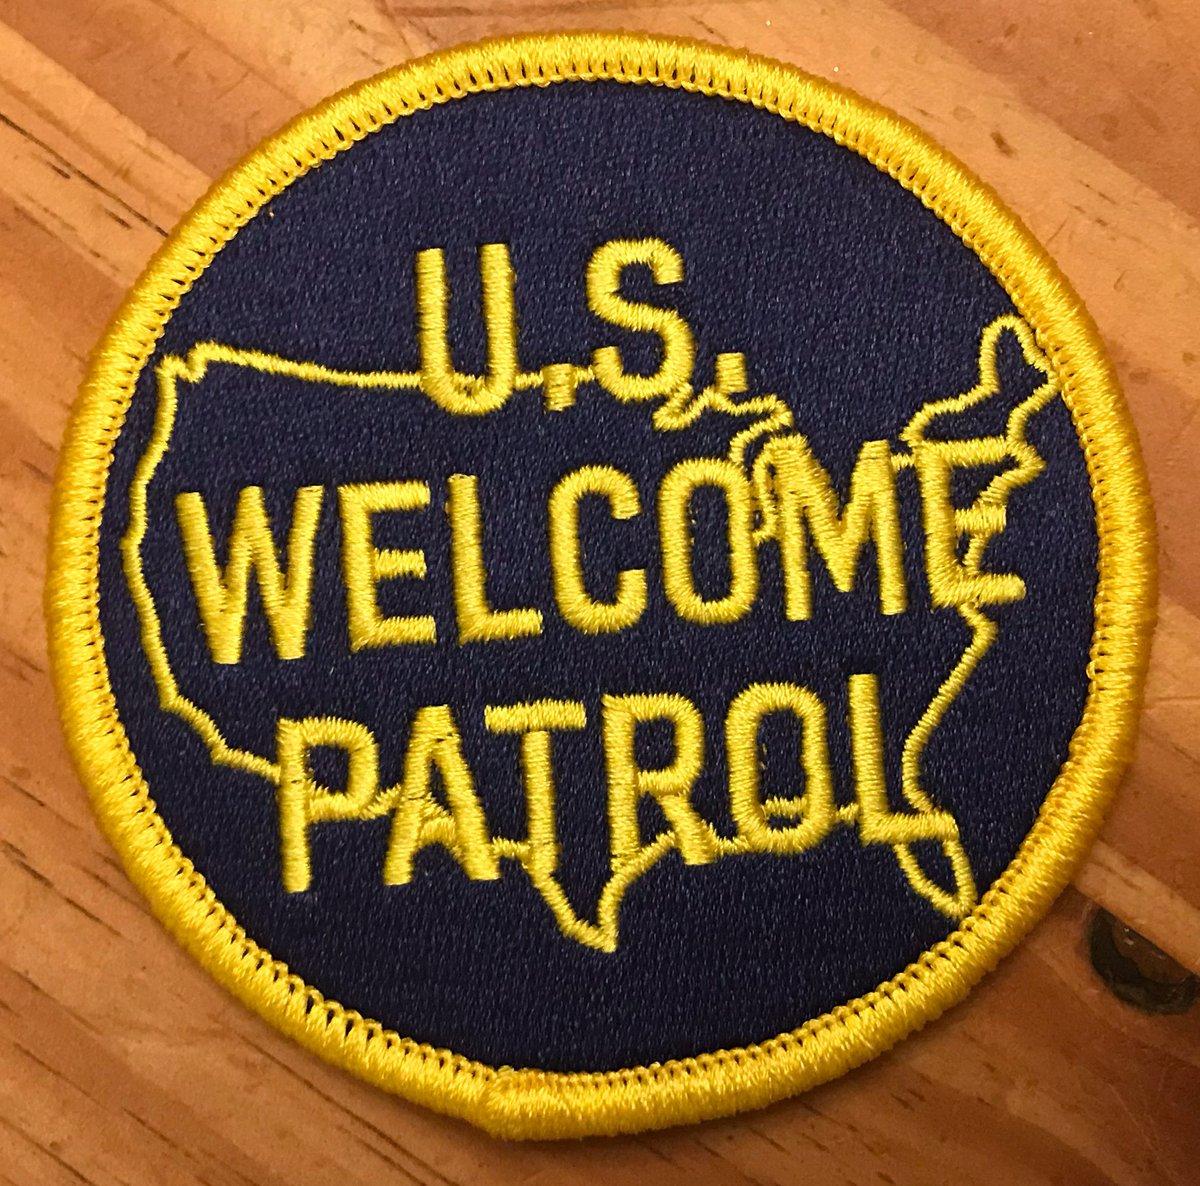 Image of U.S. WELCOME PATROL